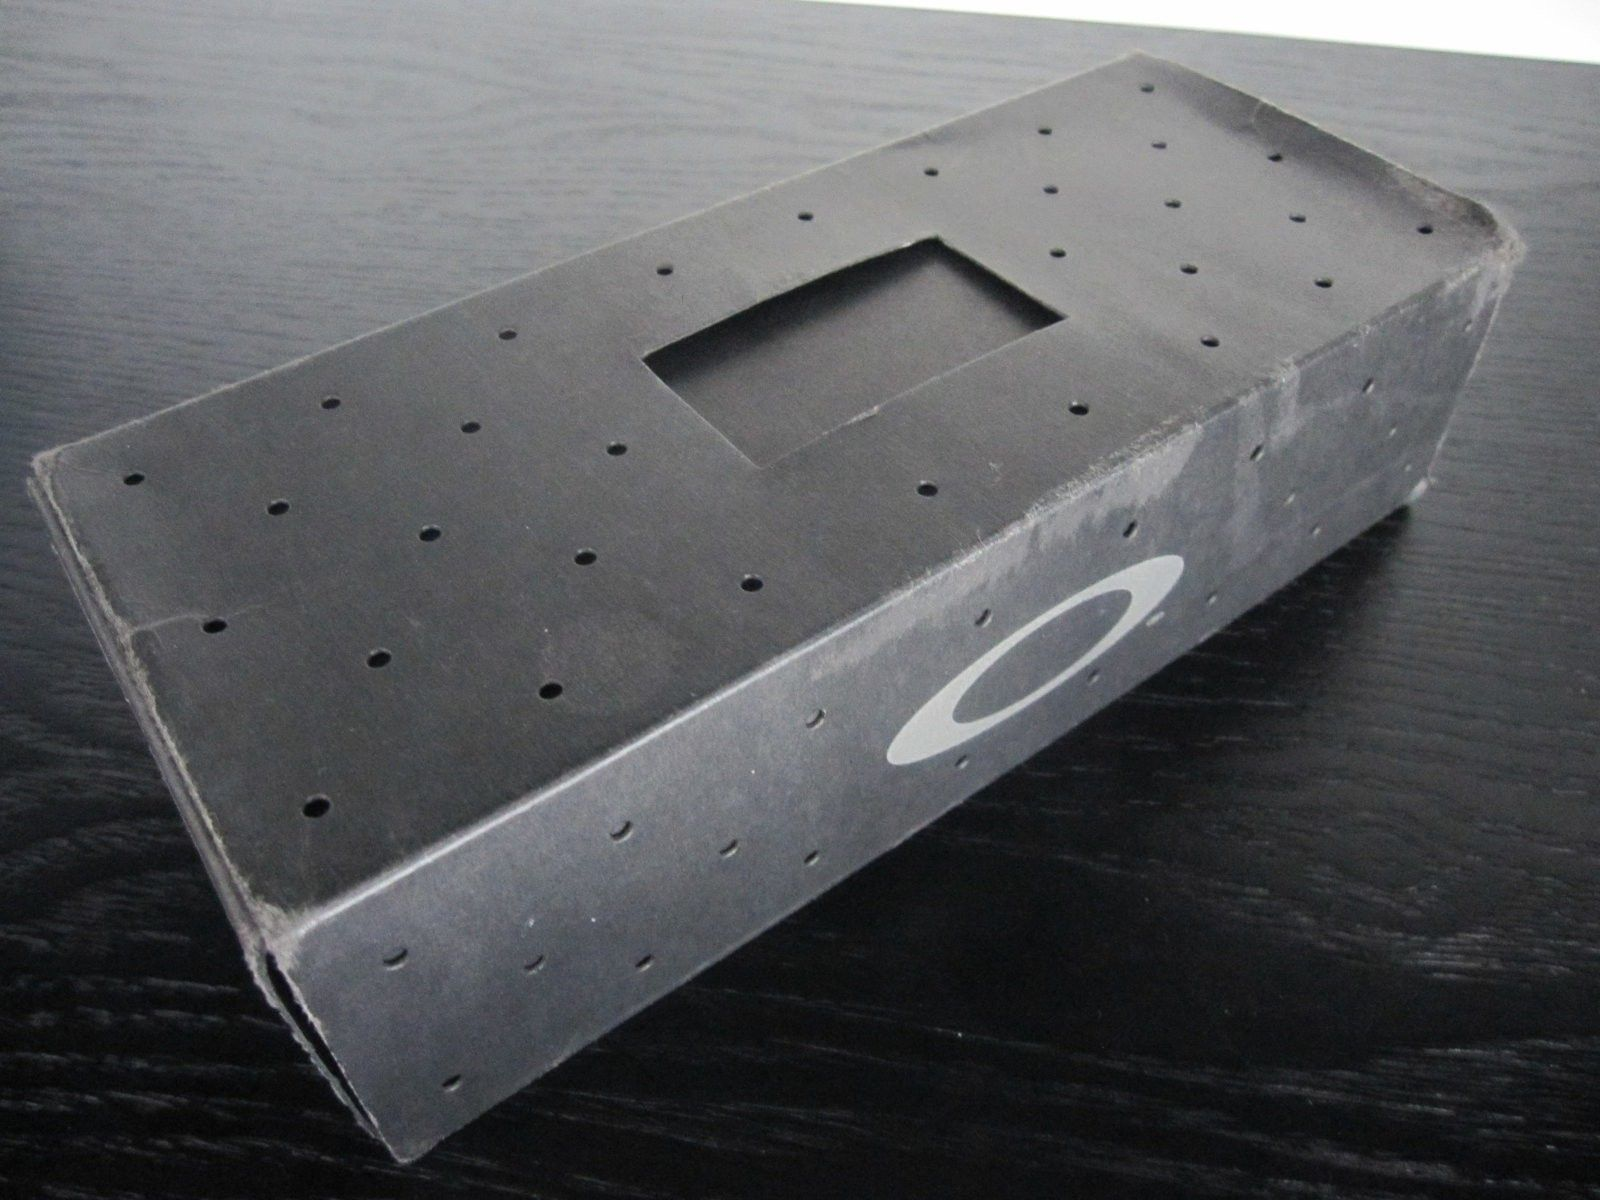 Box for Romeo 1 XM/Black Iridium - $85 - IMG_5616.JPG